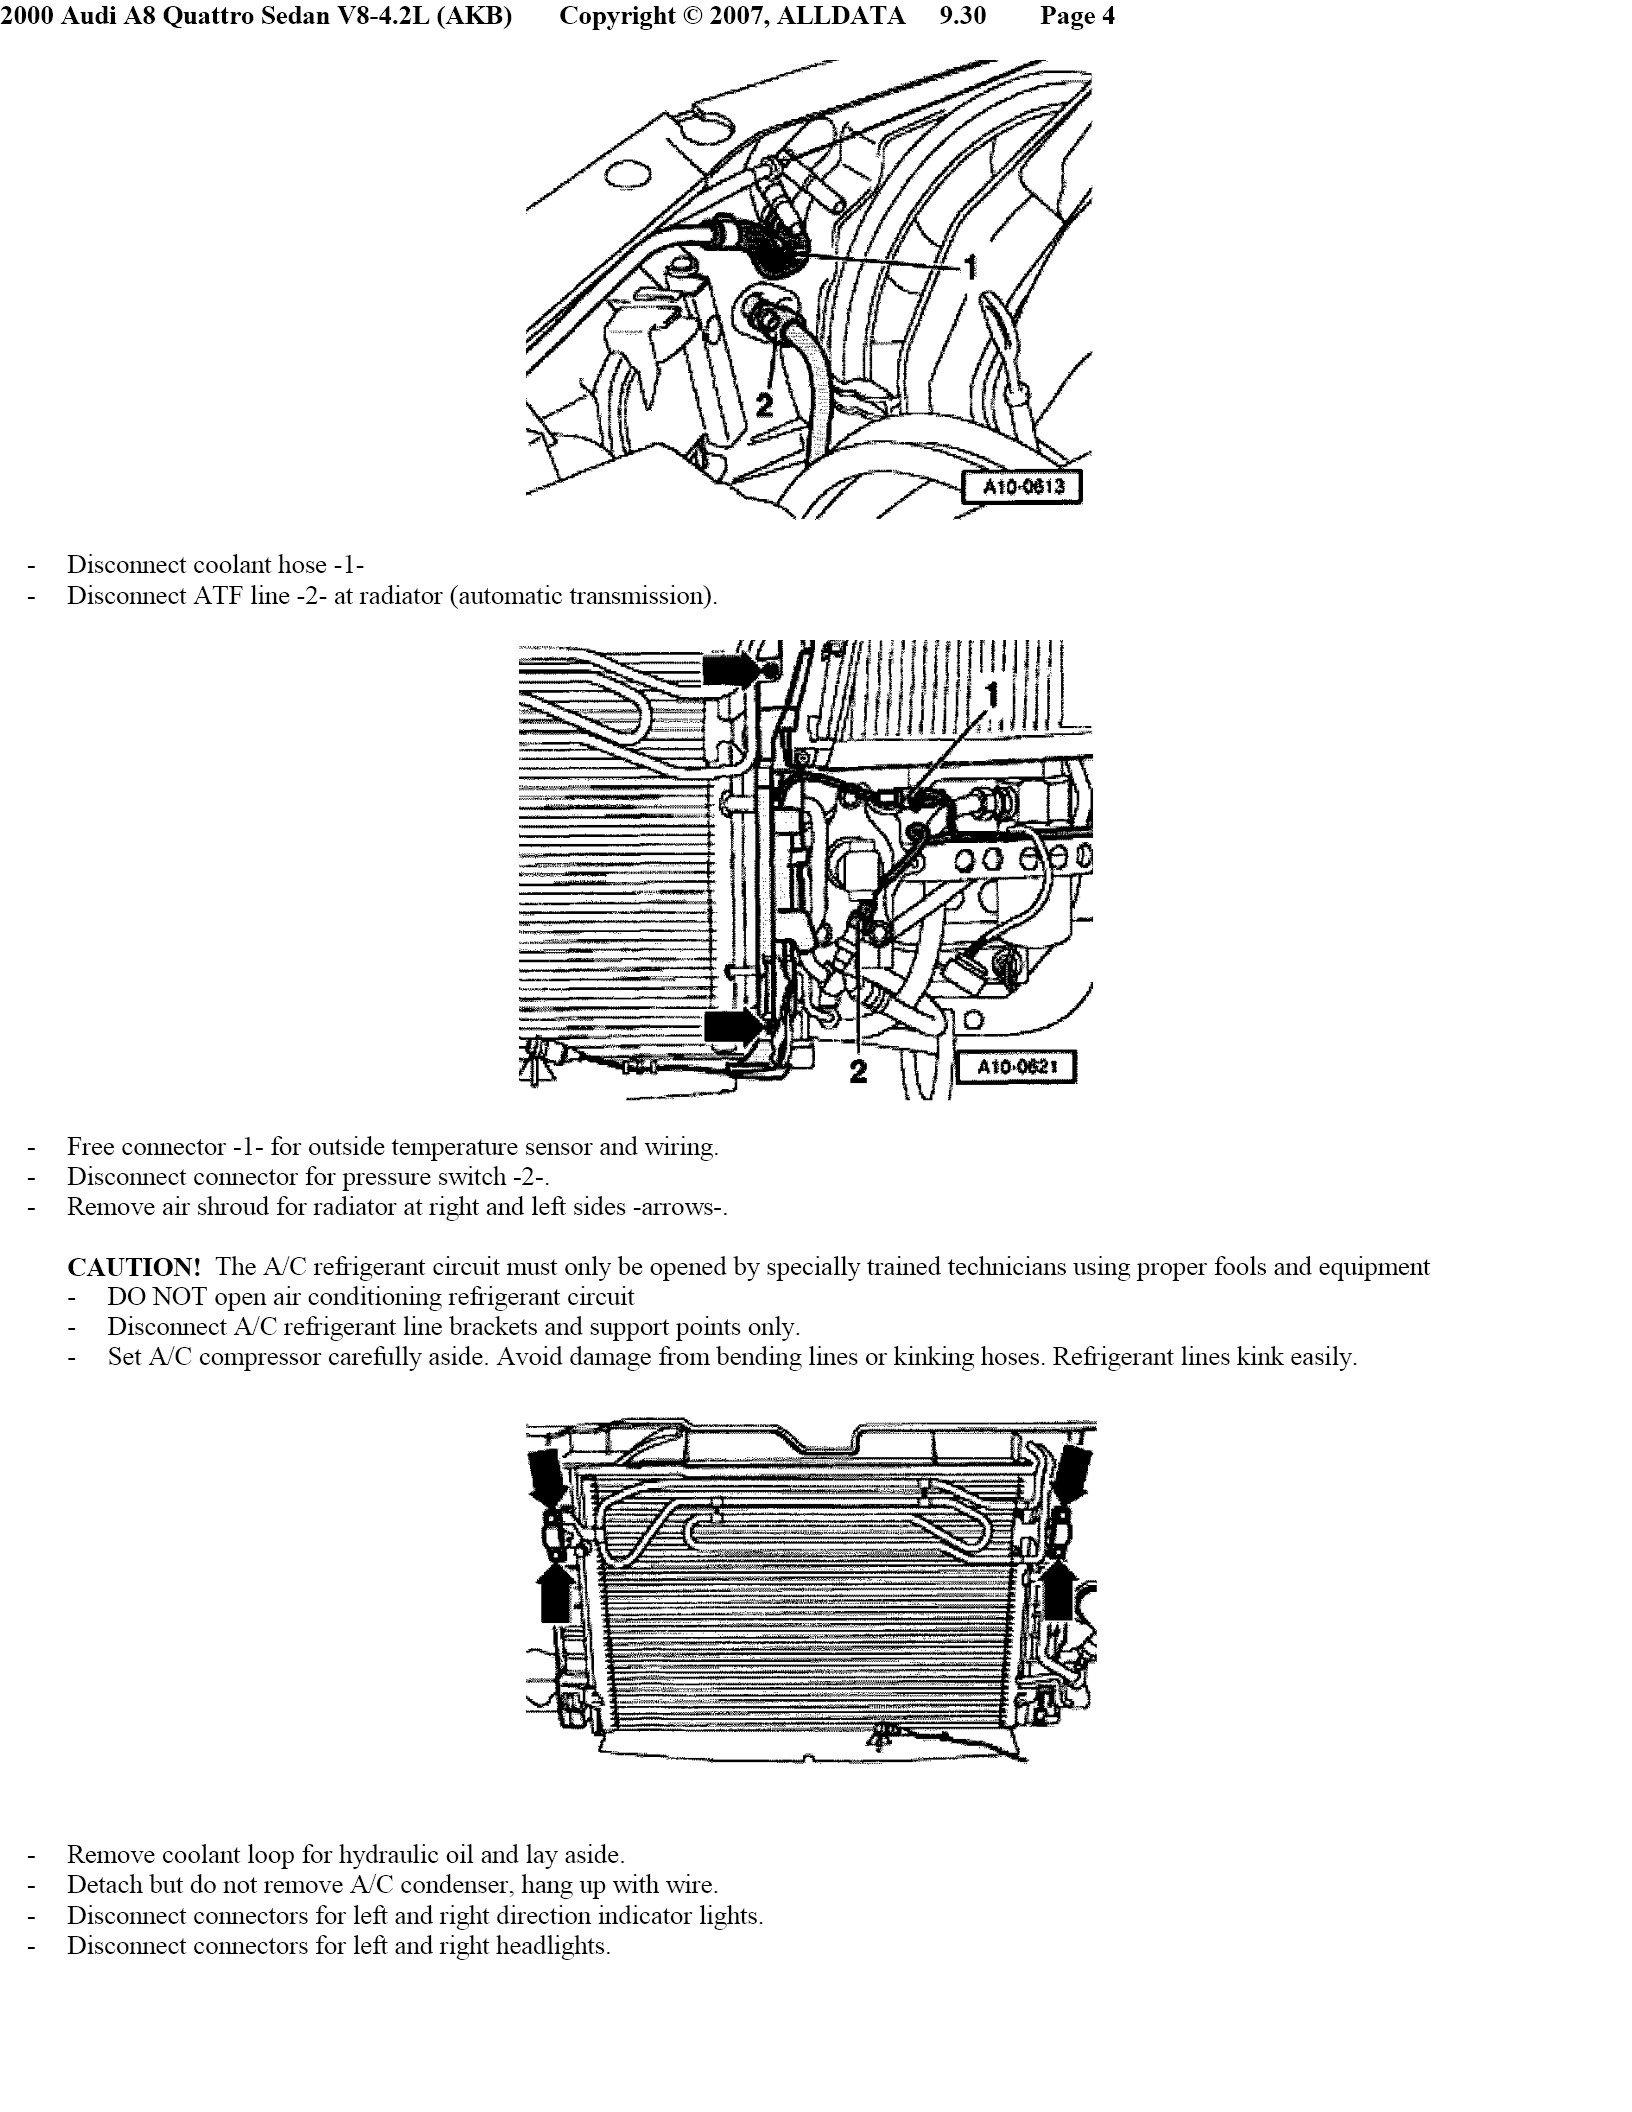 2000 jeep grand cherokee radiator fan diagram html